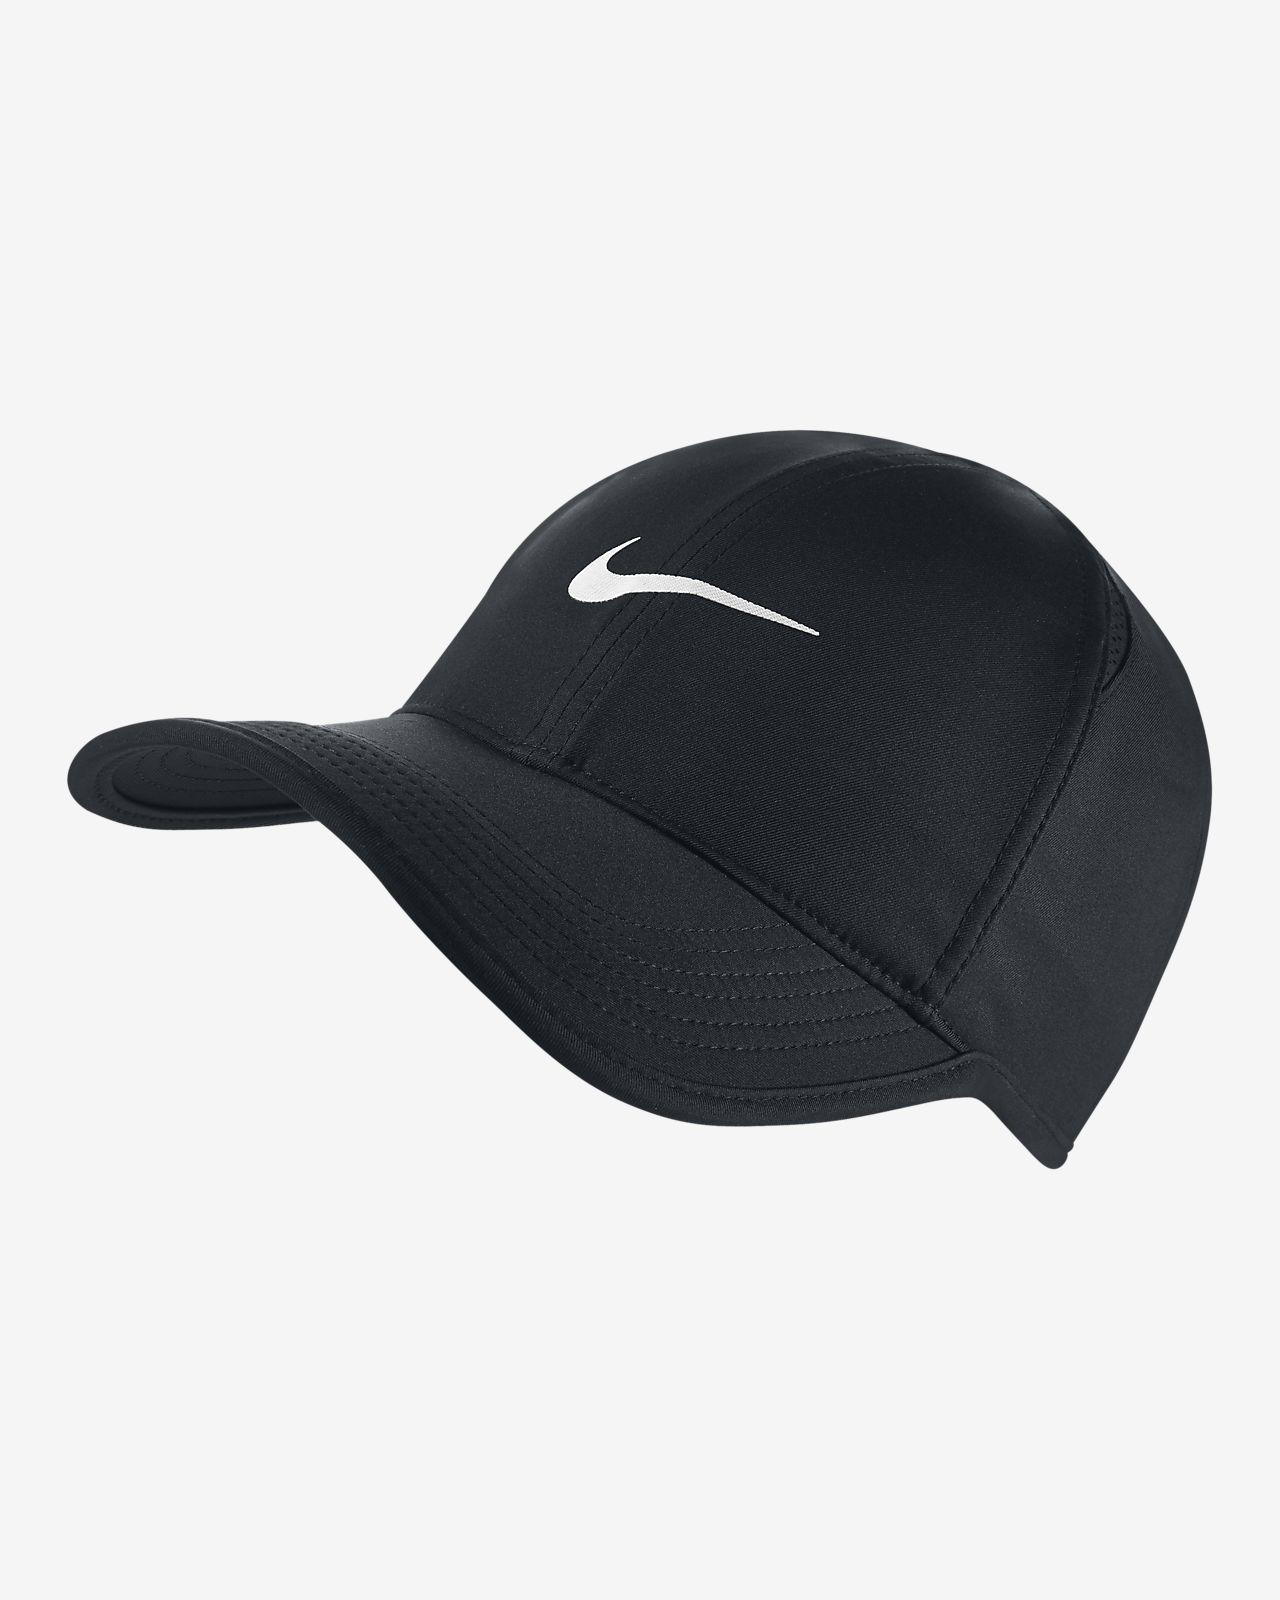 Nikecourt Aerobill Featherlight Tennis Cap Nike Cap Recycled Polyester Fabric